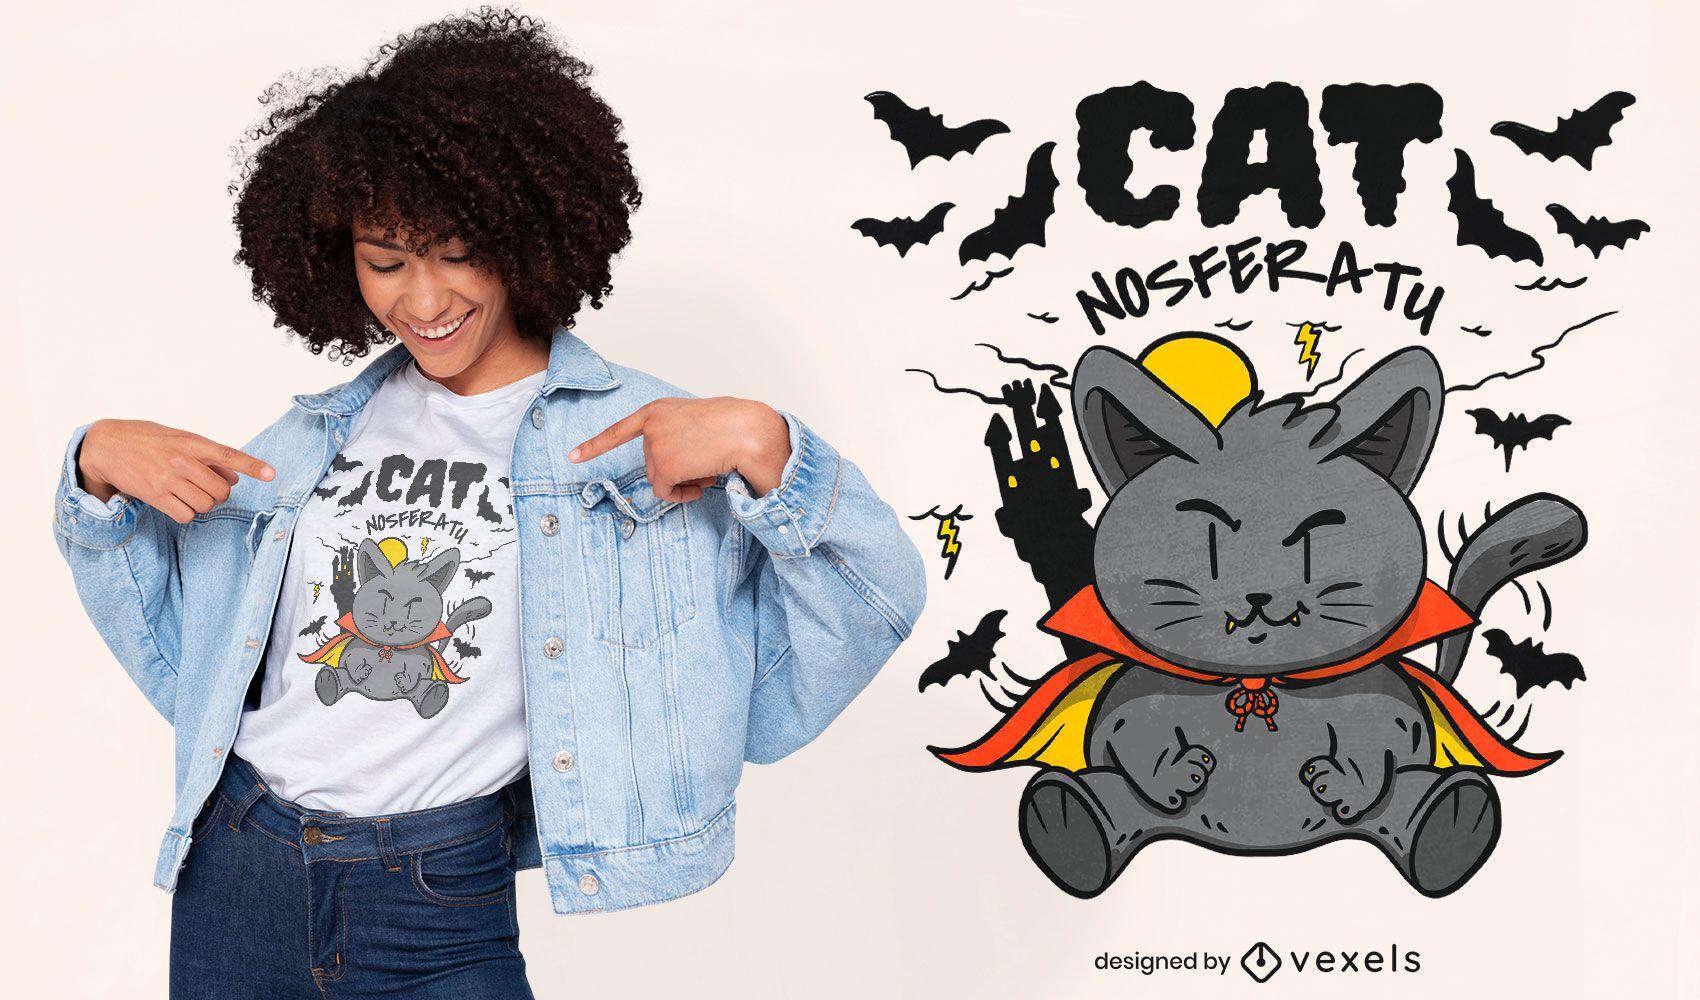 Diseño de camiseta de dibujos animados de gato vampiro Nosferatu